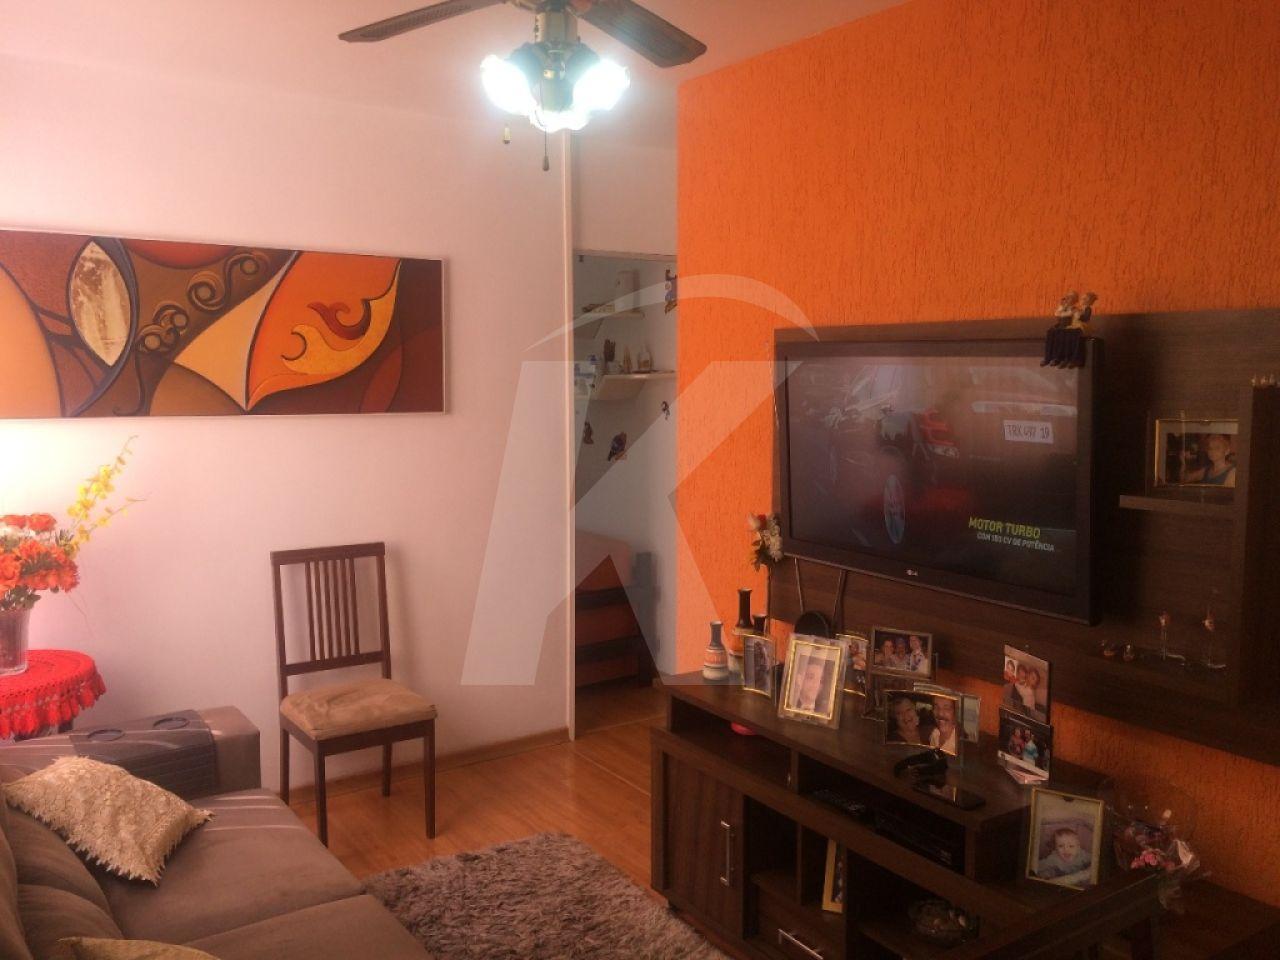 Apartamento Lauzane Paulista - 2 Dormitório(s) - São Paulo - SP - REF. KA9650